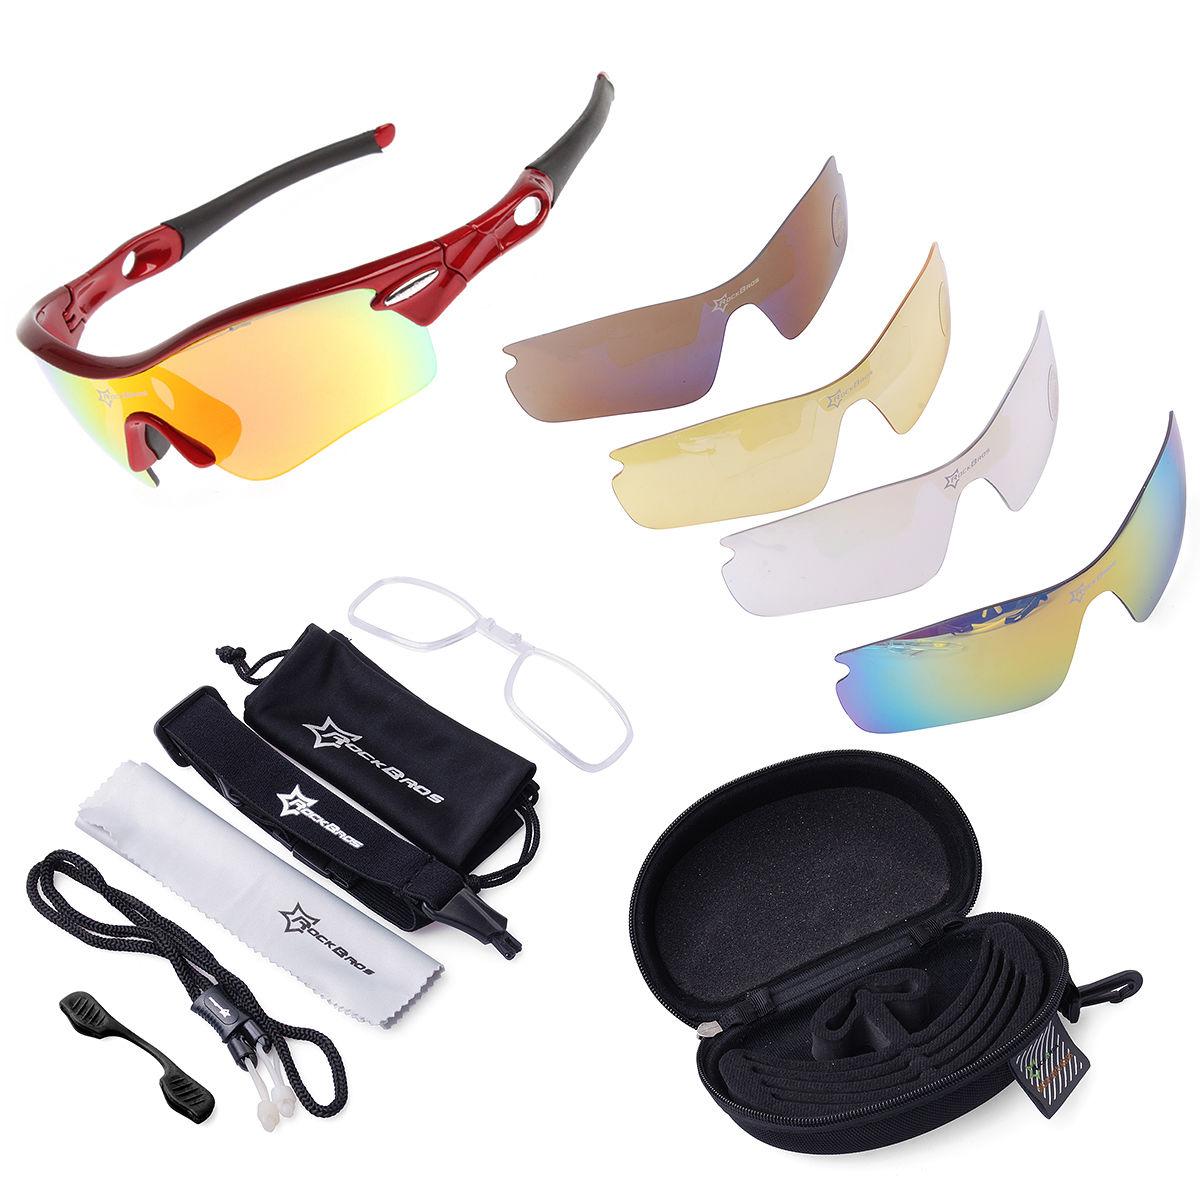 78c664c2620 Rockbros Polarized Cycling Glasses Sports Glasses Sunglasses Goggles White